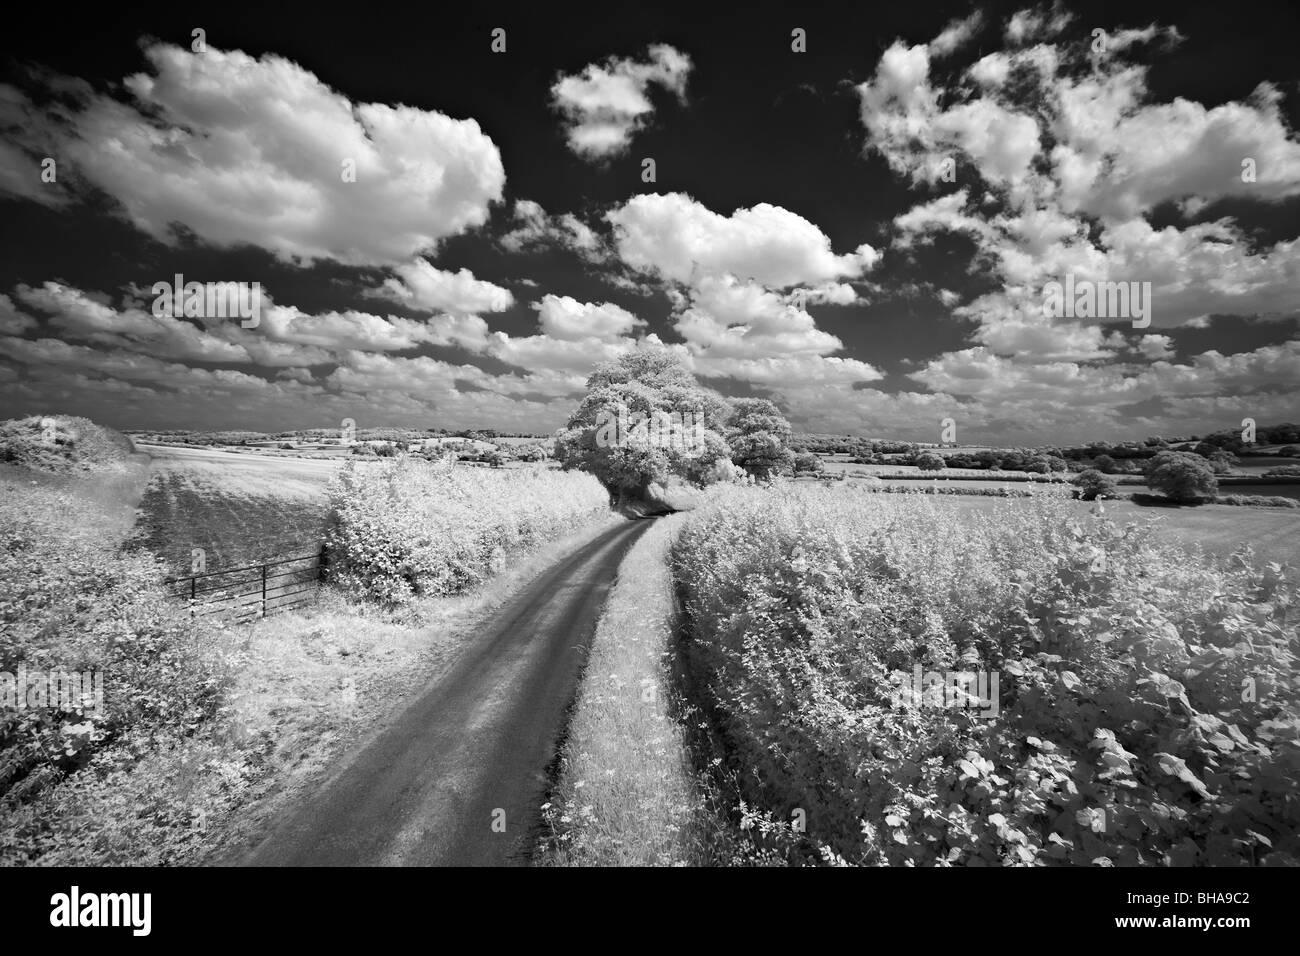 a country lane, nr Up Cerne, Dorset, England, UK - Stock Image